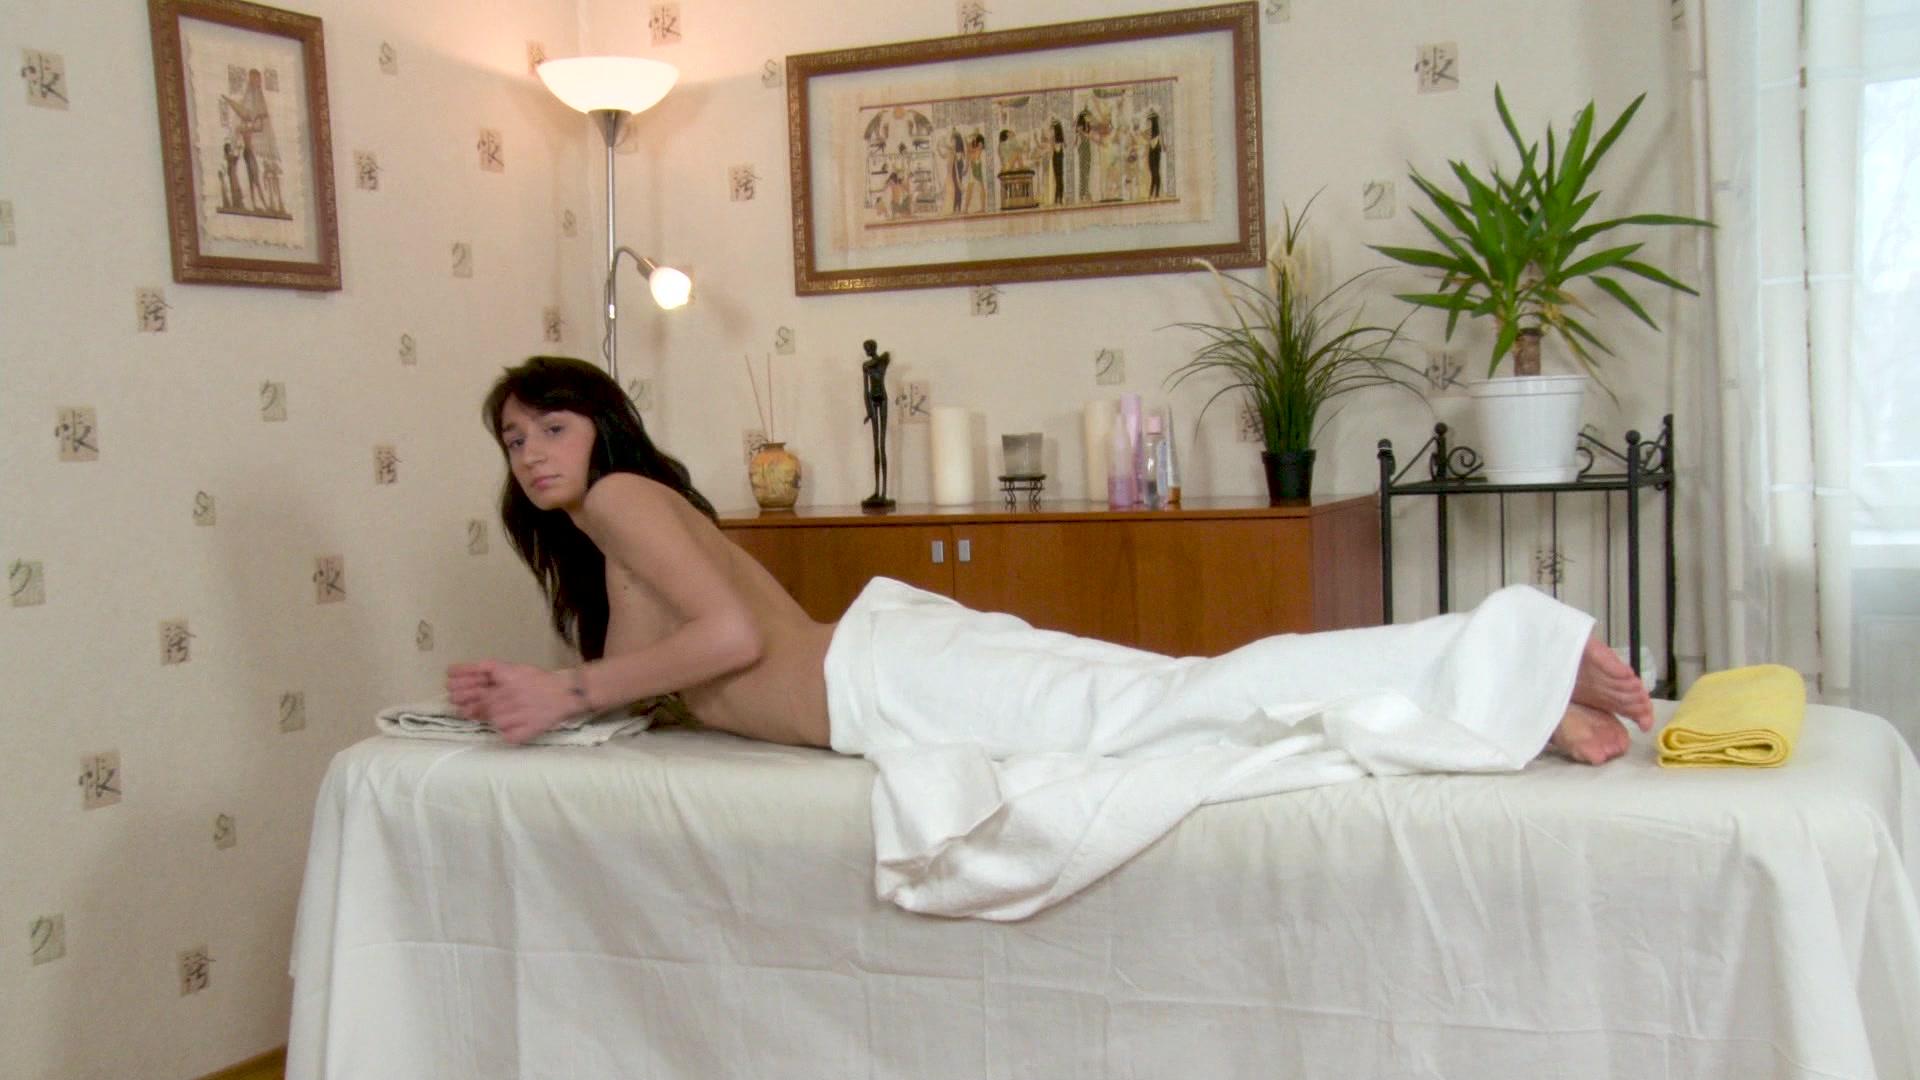 khloe kardashian naked pics